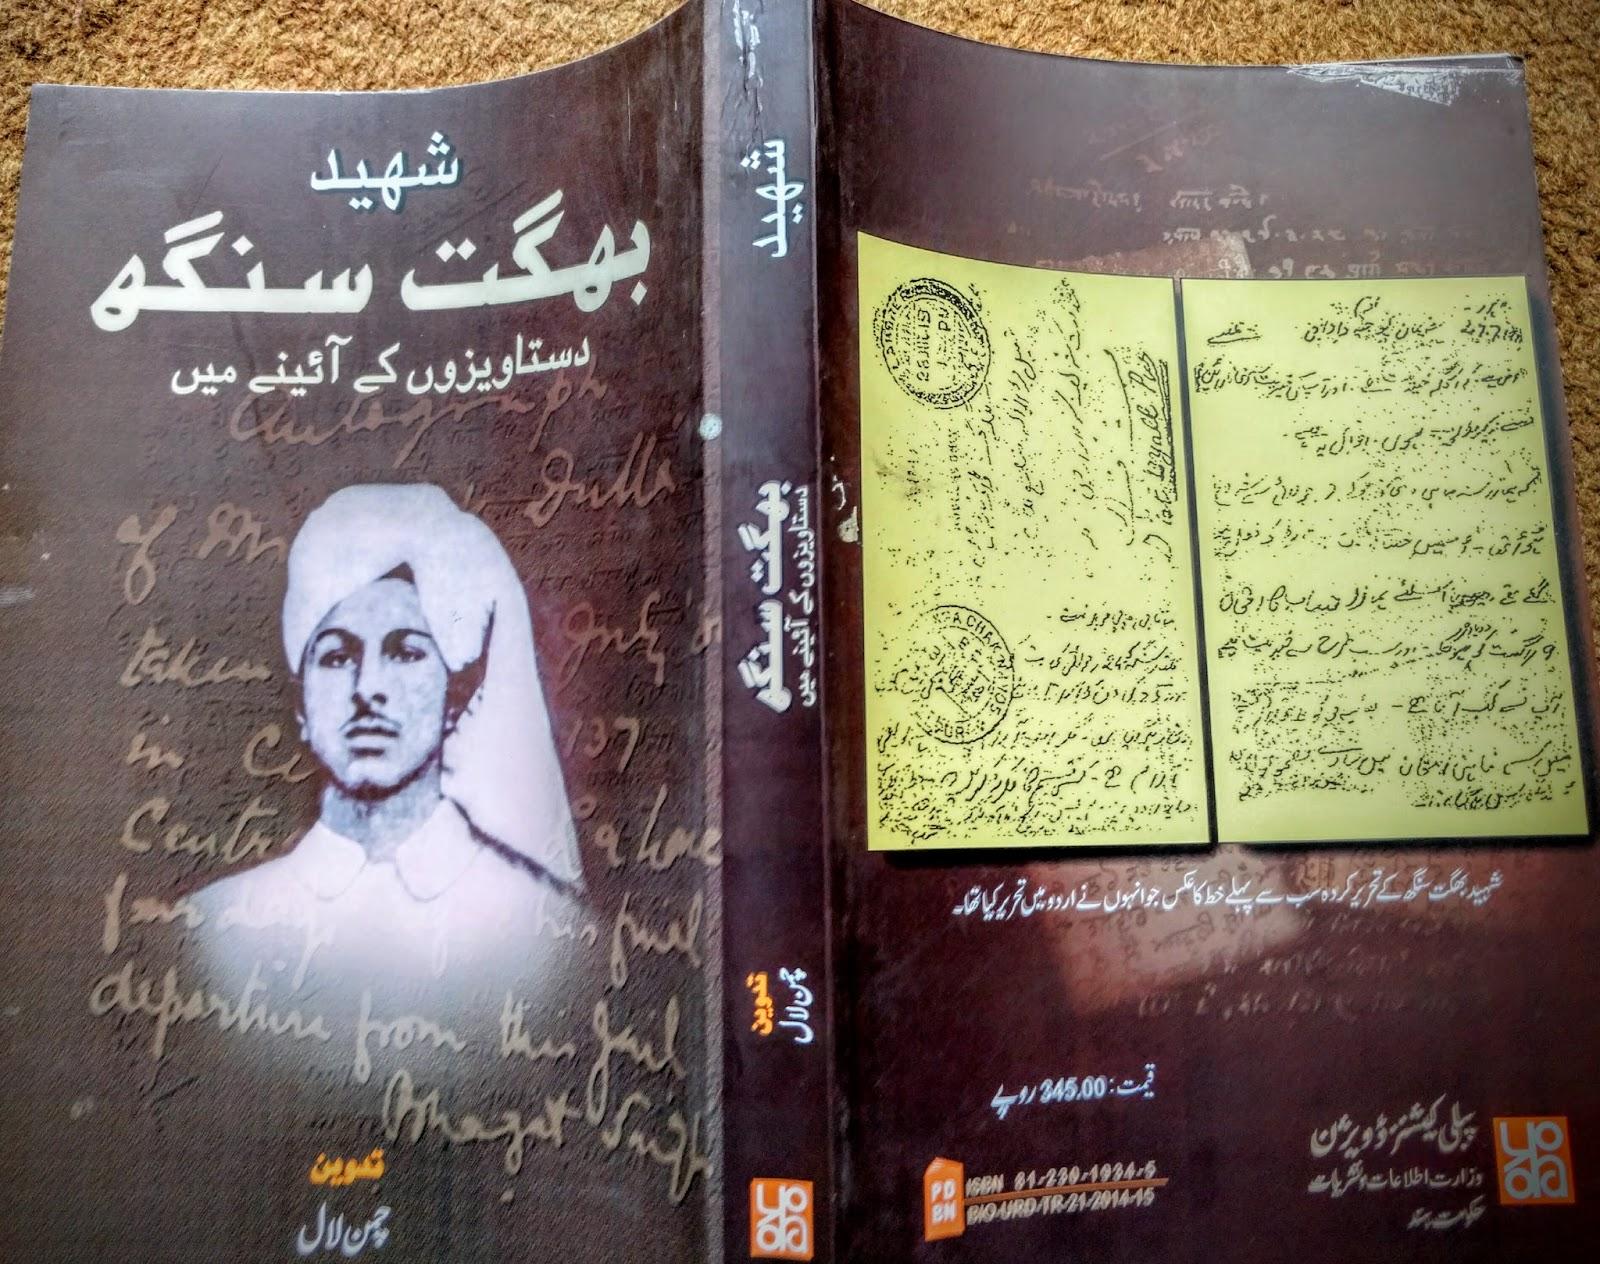 bhagat singh study chaman lal shaheed bhagat singh complete apnaorg com books urdu bhagat singh dastaveezen book php fldr book